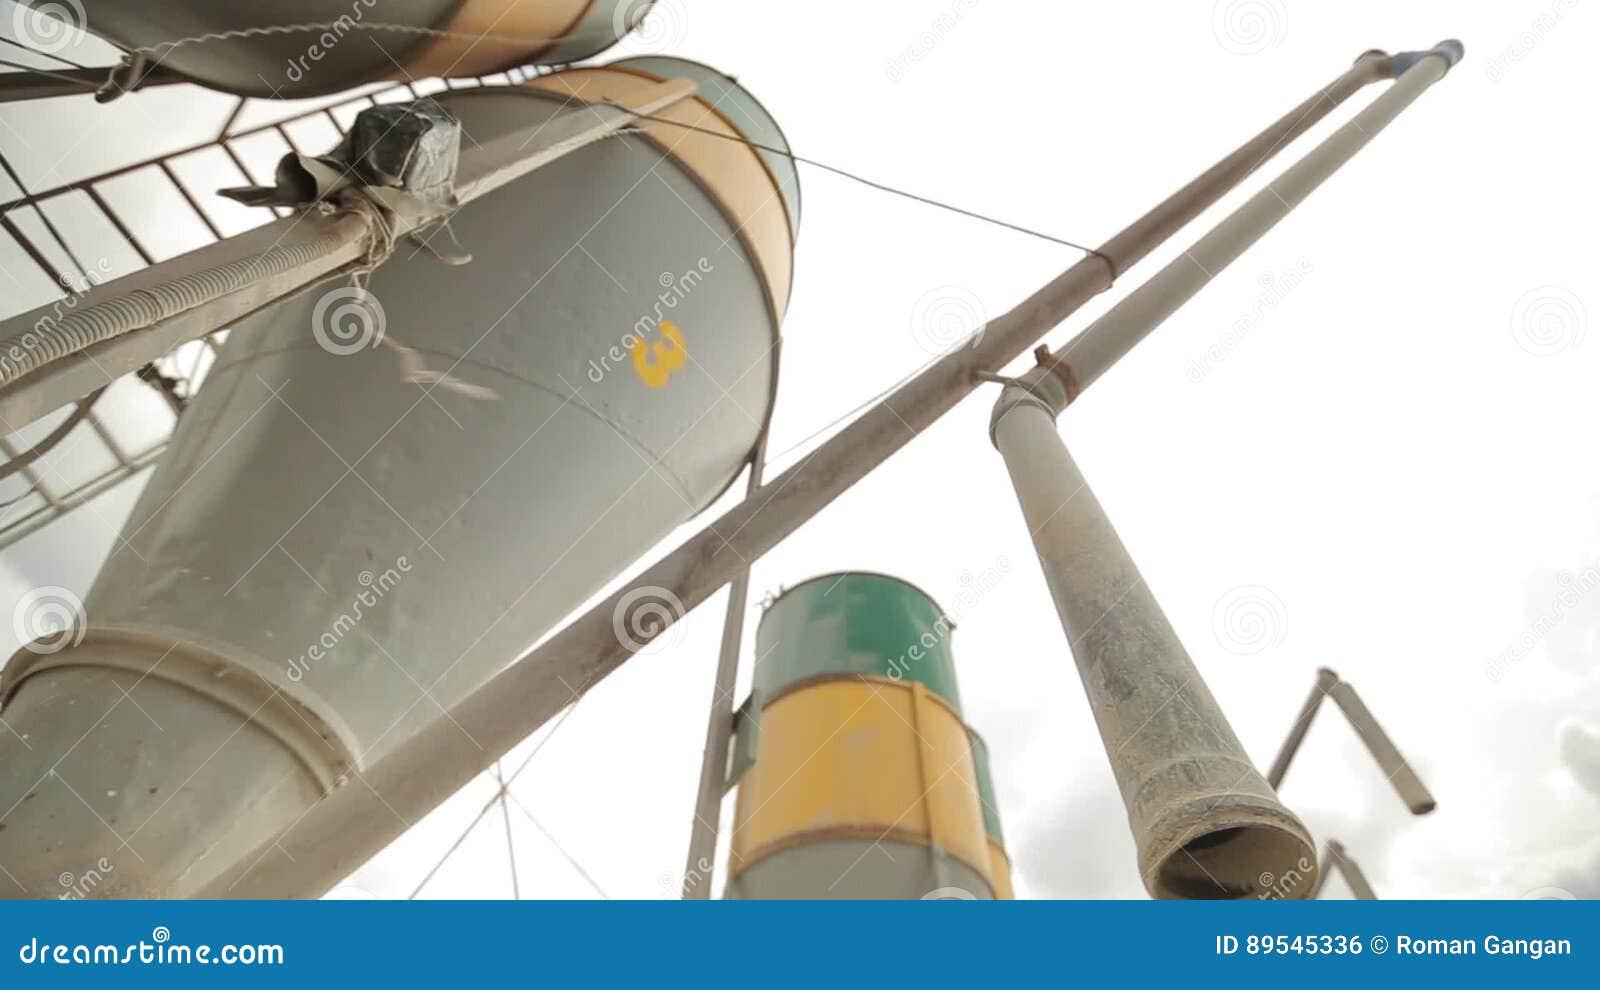 Auger-Elevator, Elevator for vysypte grain in the car   Onthegounloadingconveyor, binemptying